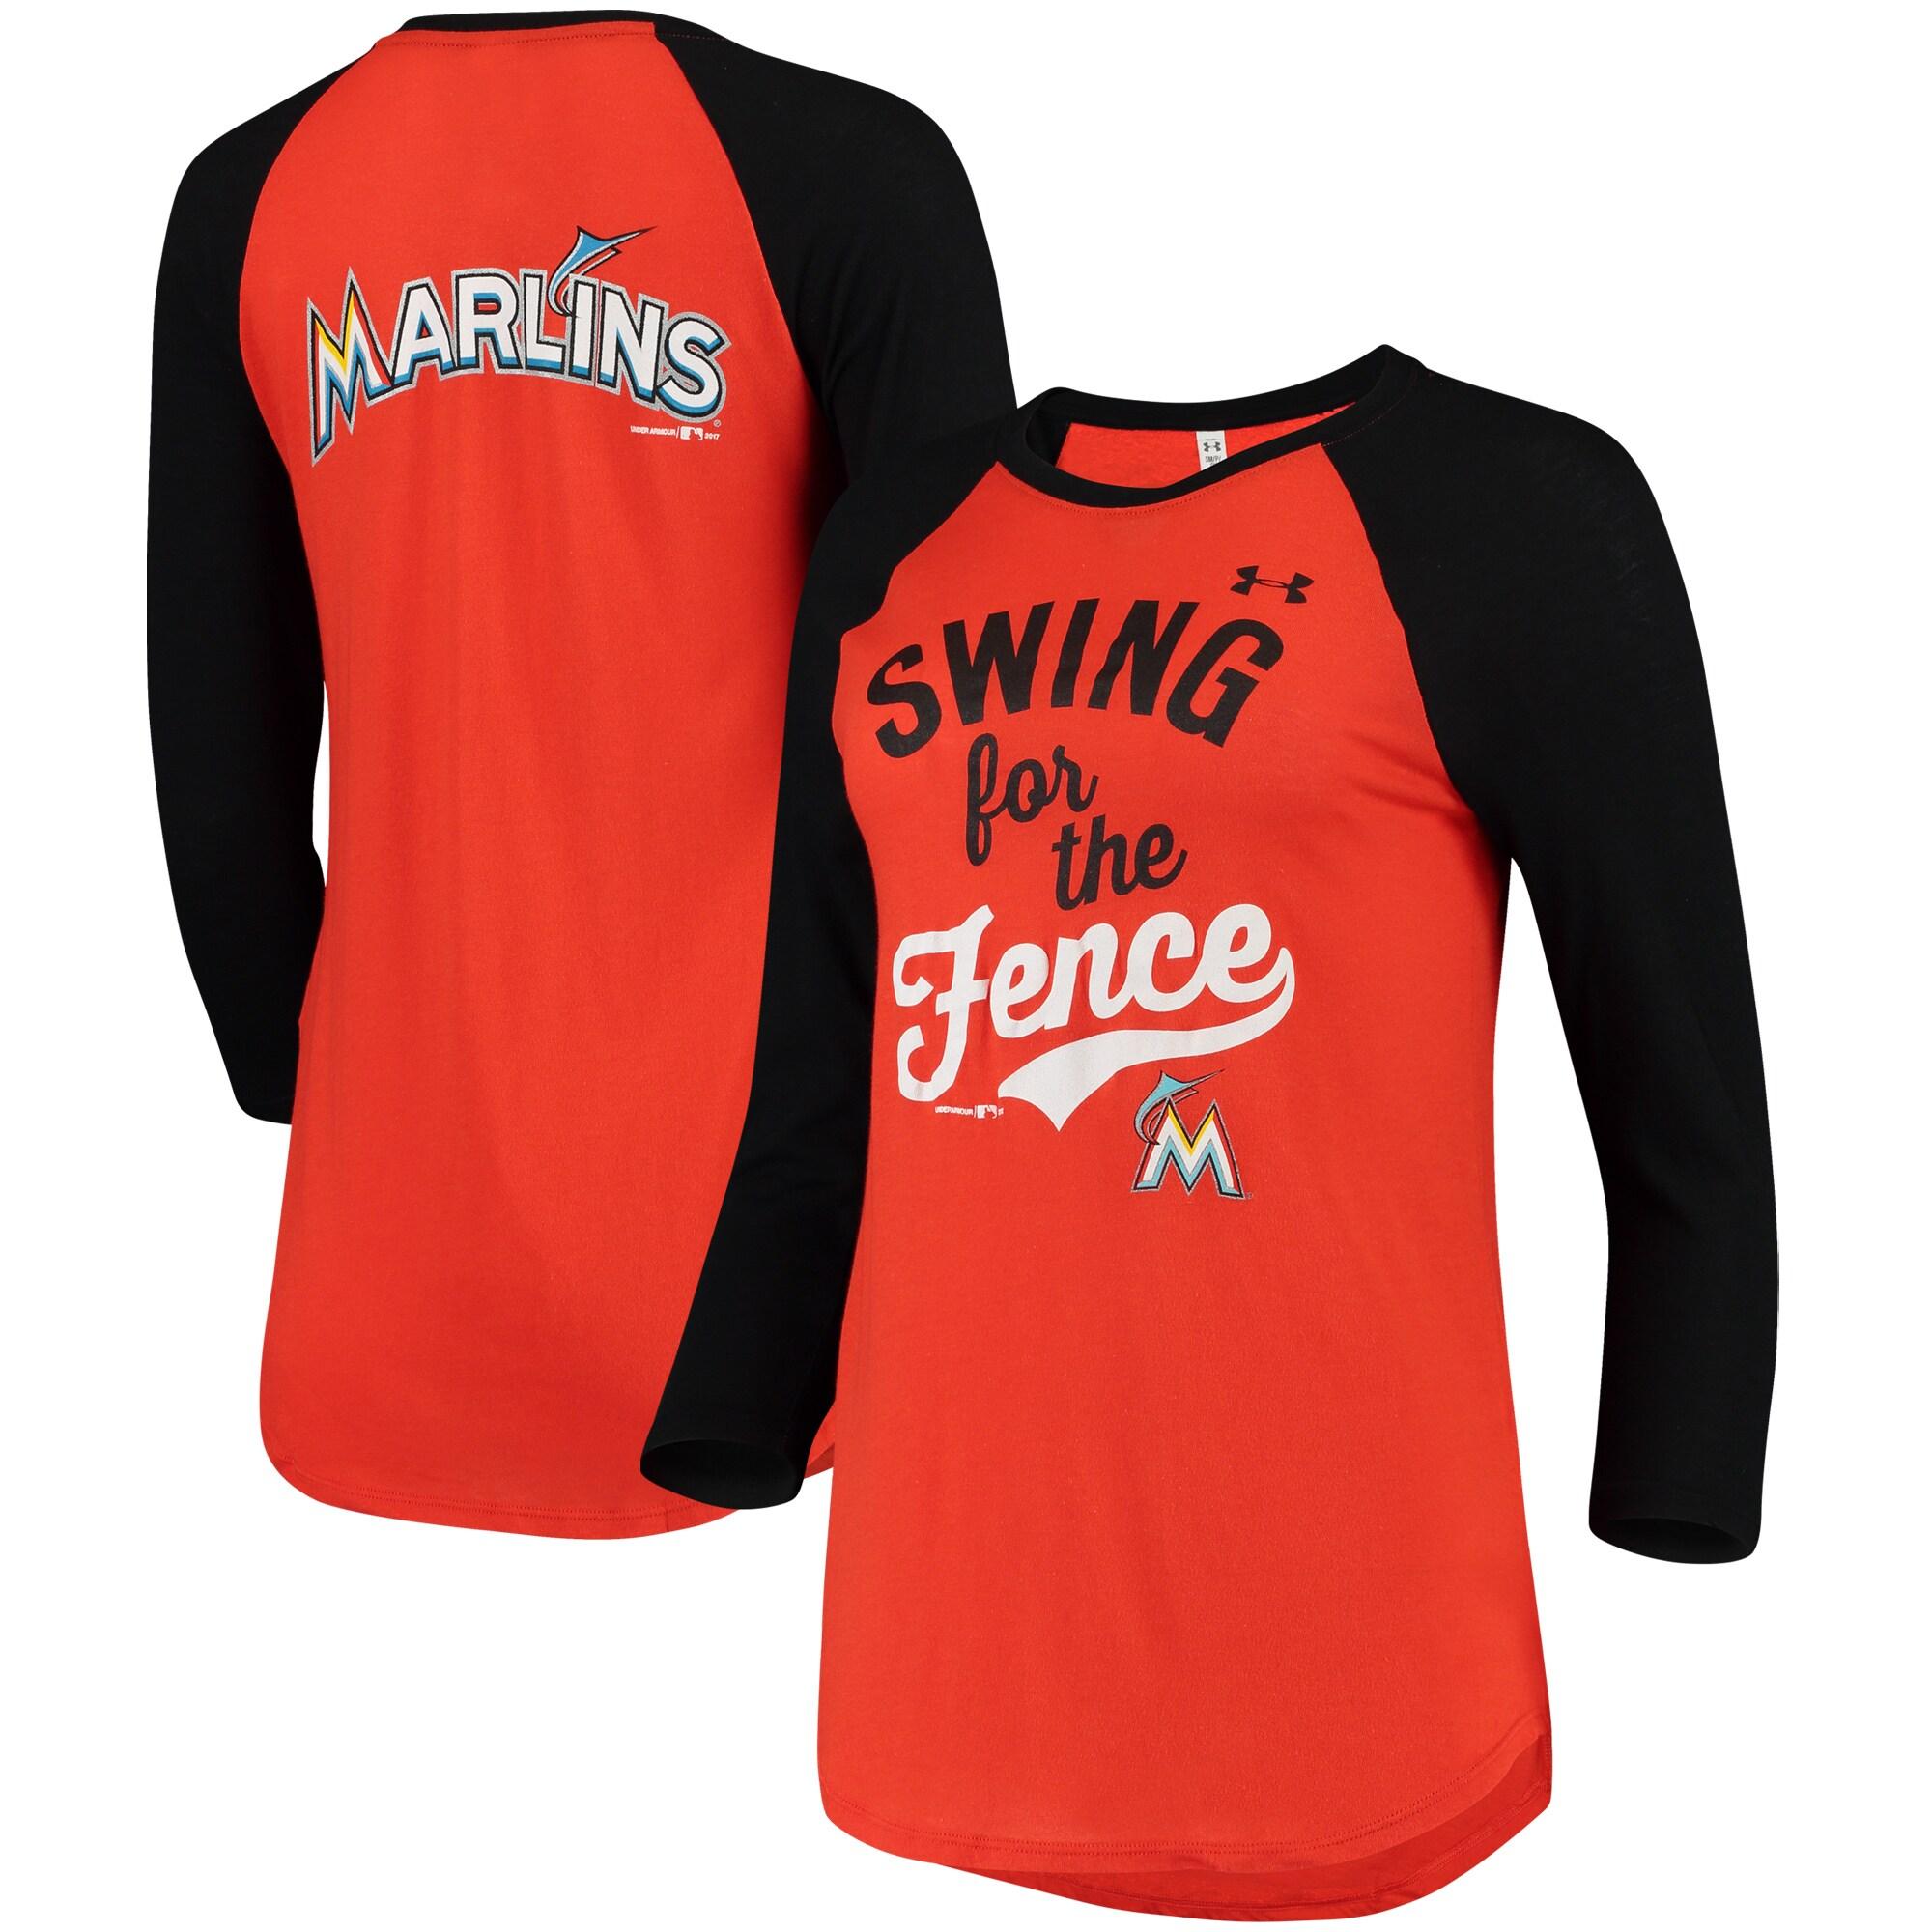 Miami Marlins Under Armour Women's Baseball 3/4-Sleeve Performance T-Shirt - Orange/Black